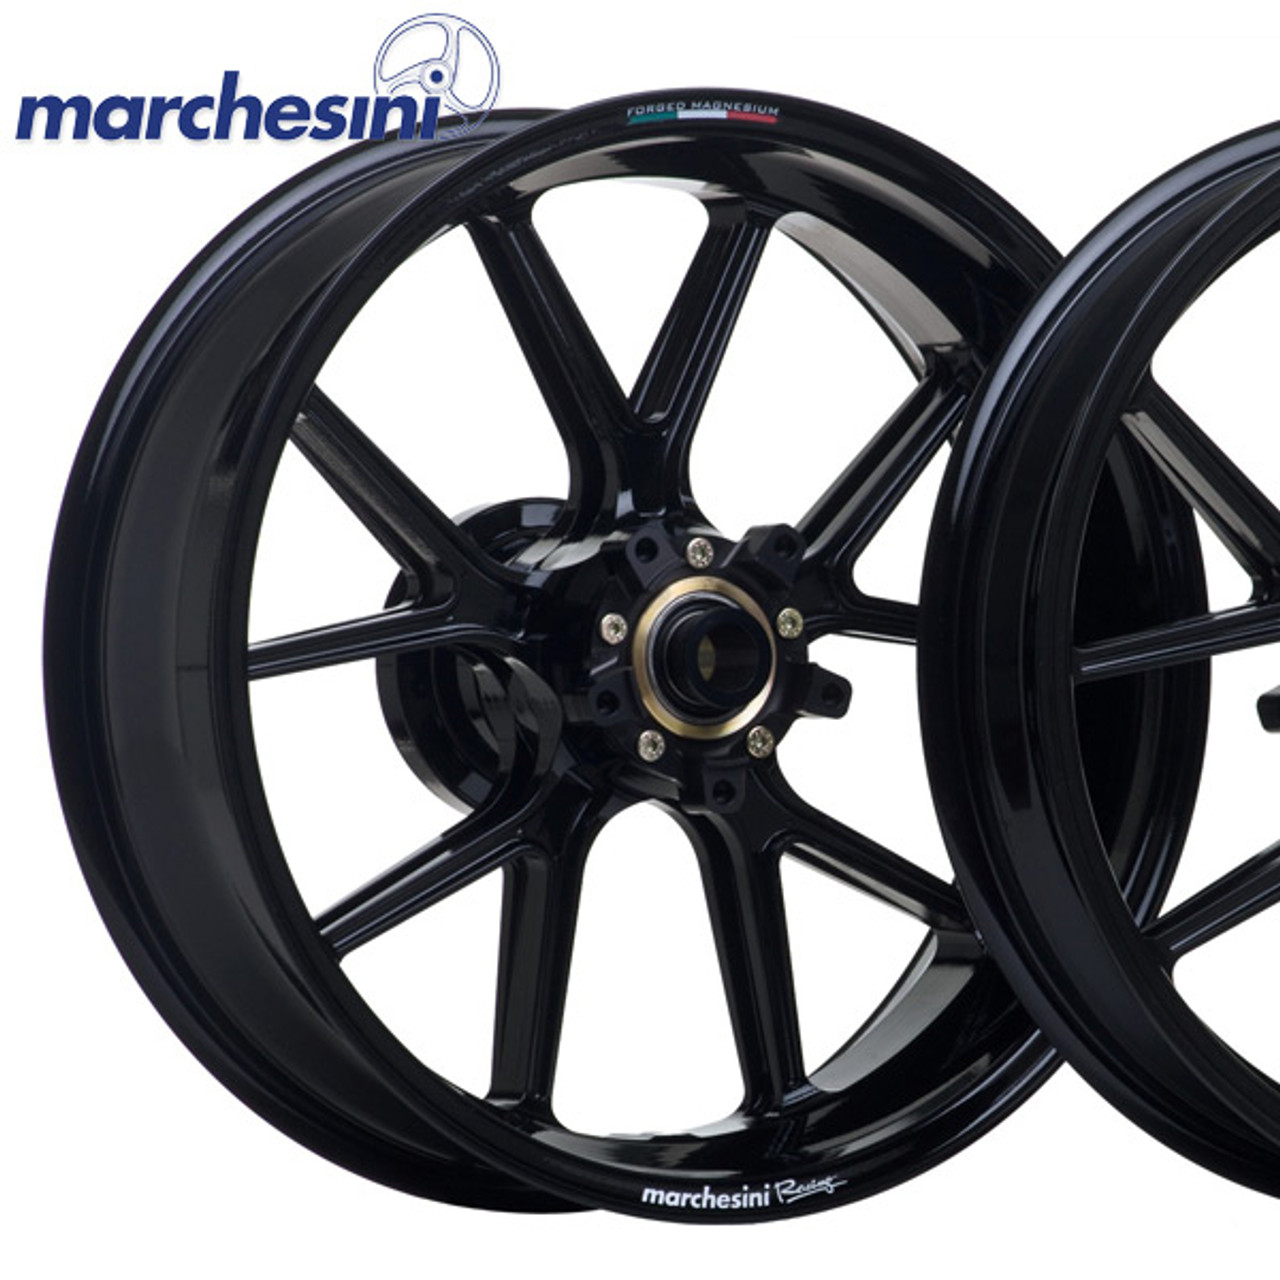 Marchesini Forged Aluminum M10r Rear Wheel Honda Cbr600rr 05 06